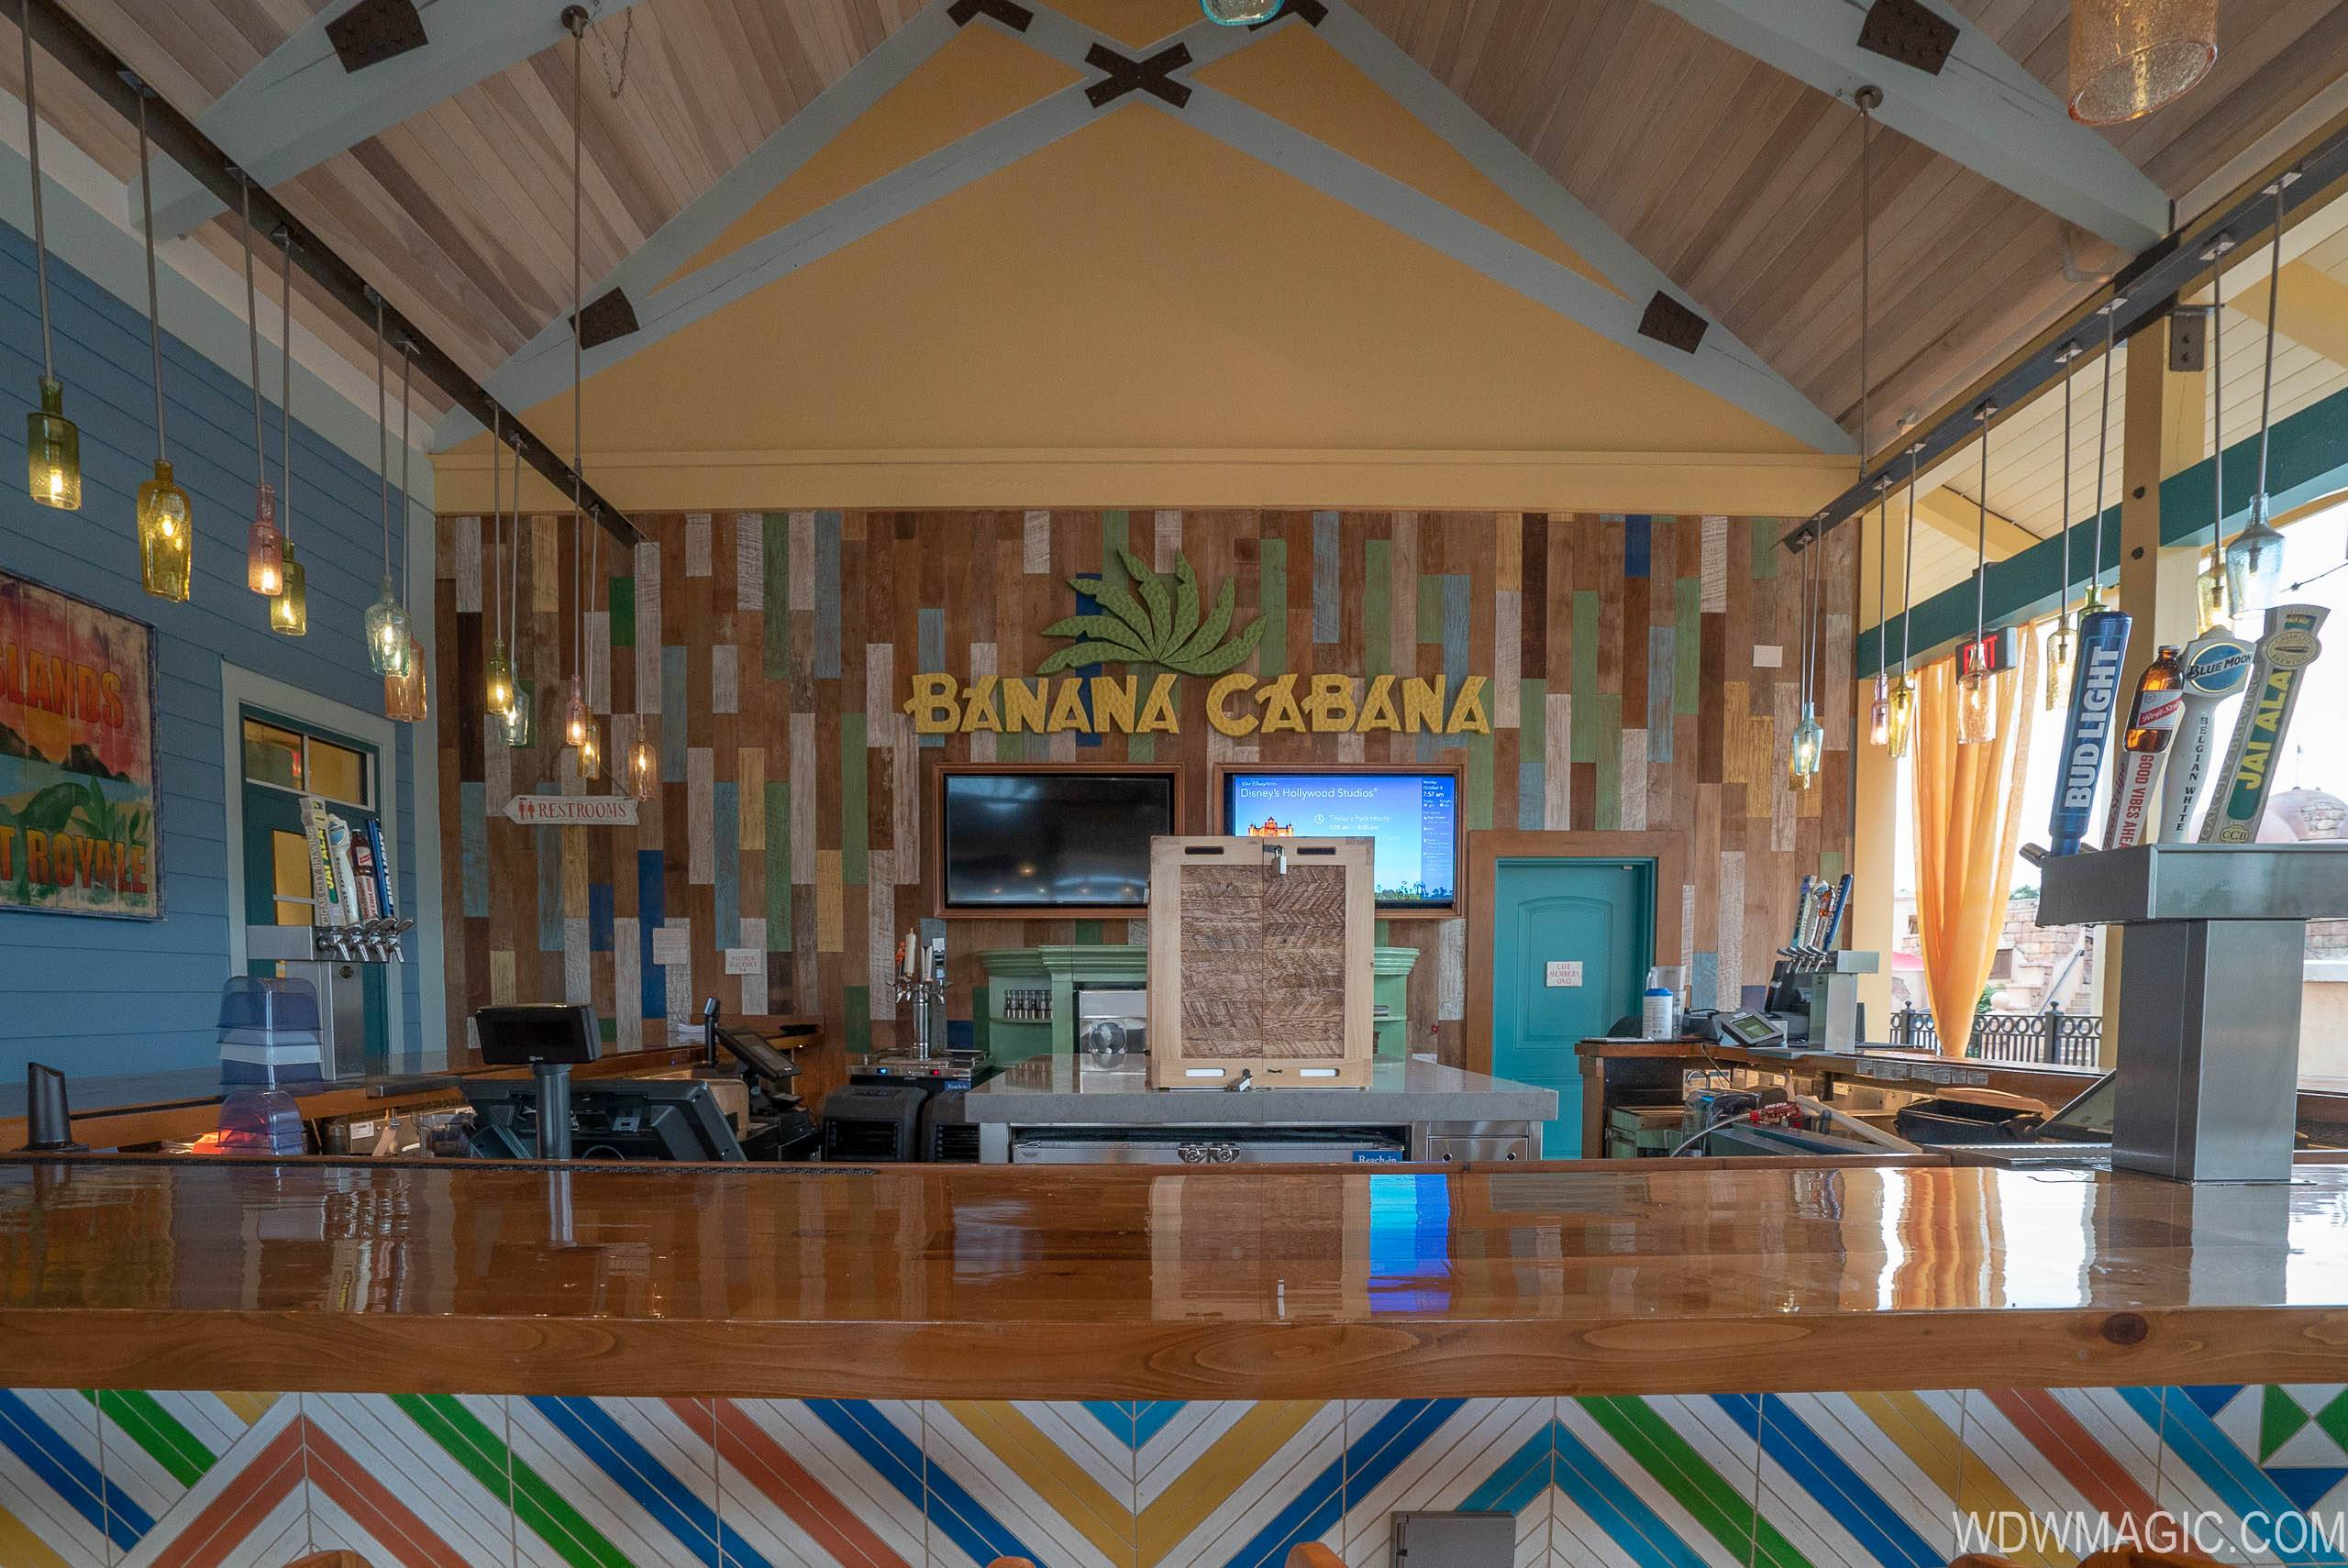 Banana Cabana overview